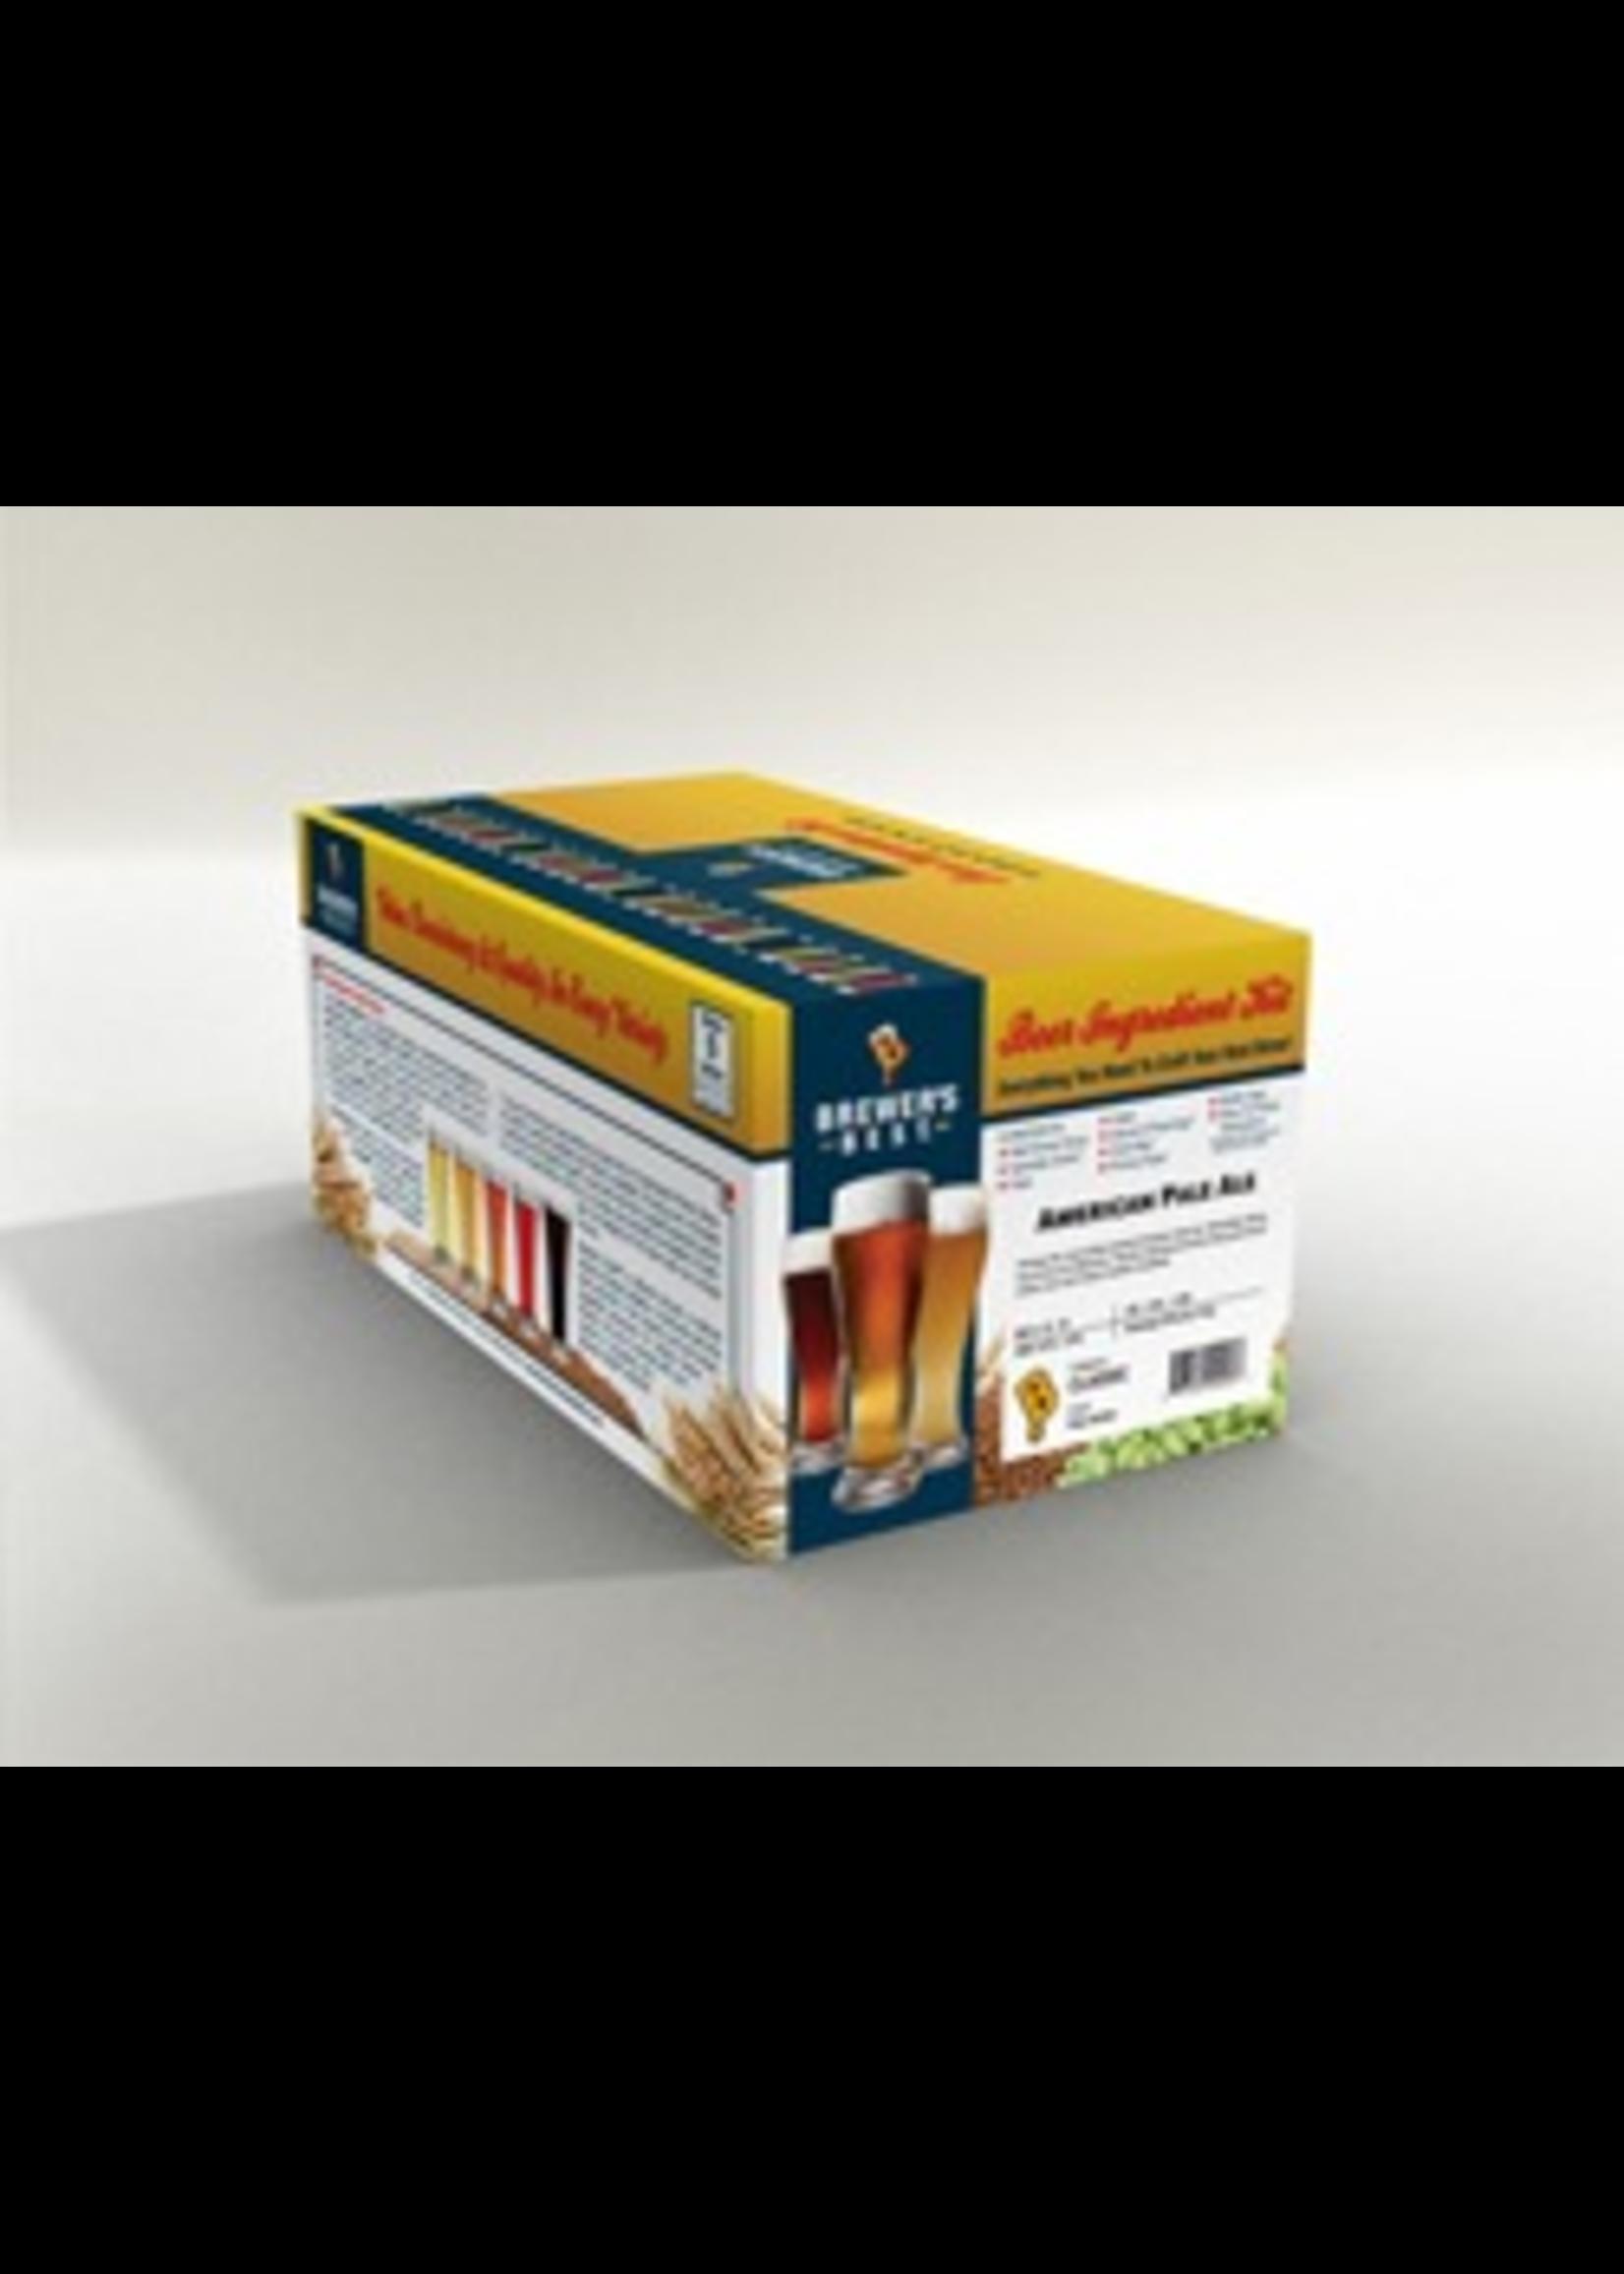 Ingredient Kits Brewer's Best India Pale Ale - 5 Gallon Ingredient Kit